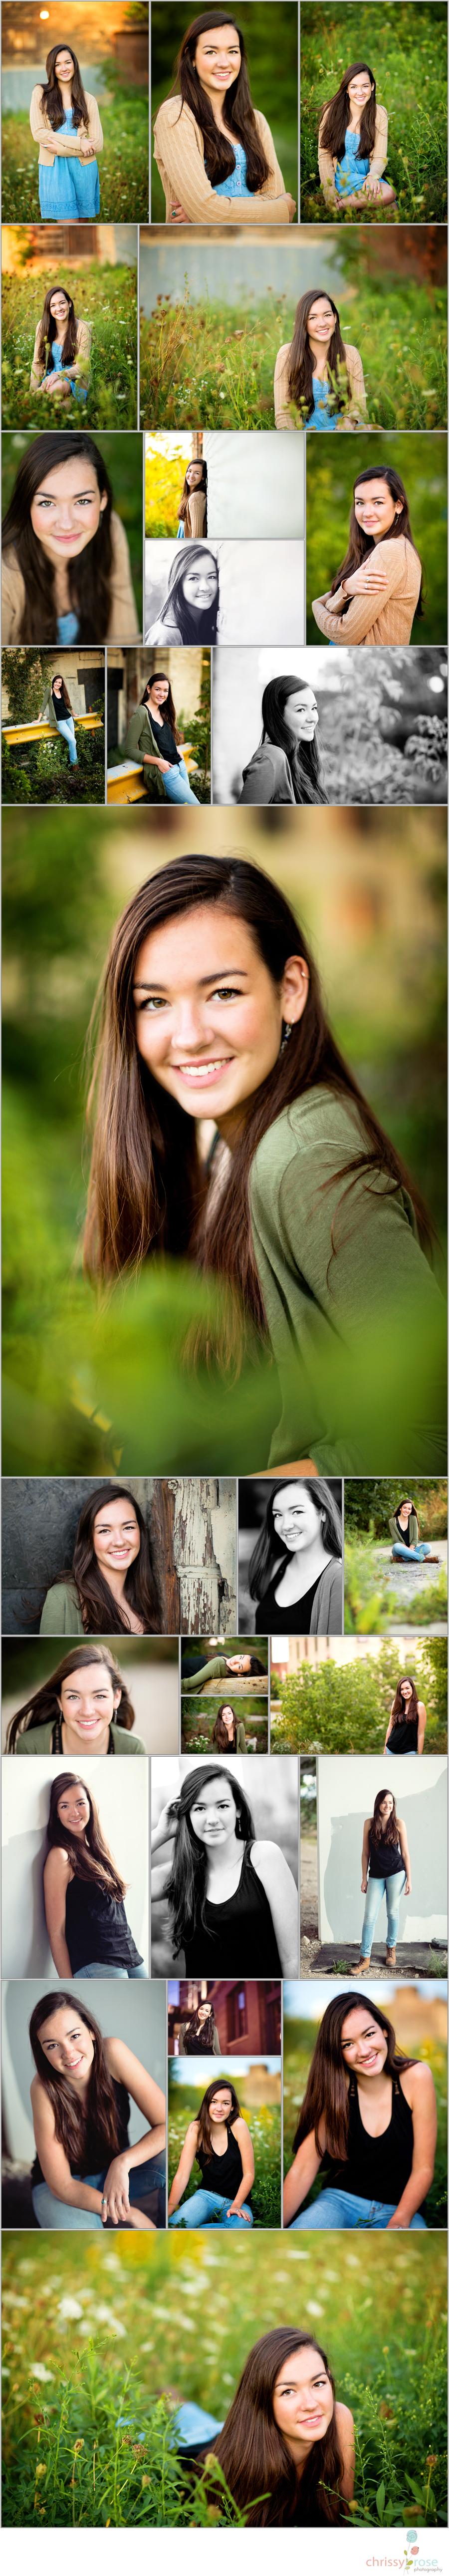 Blog Collage-1351812978066